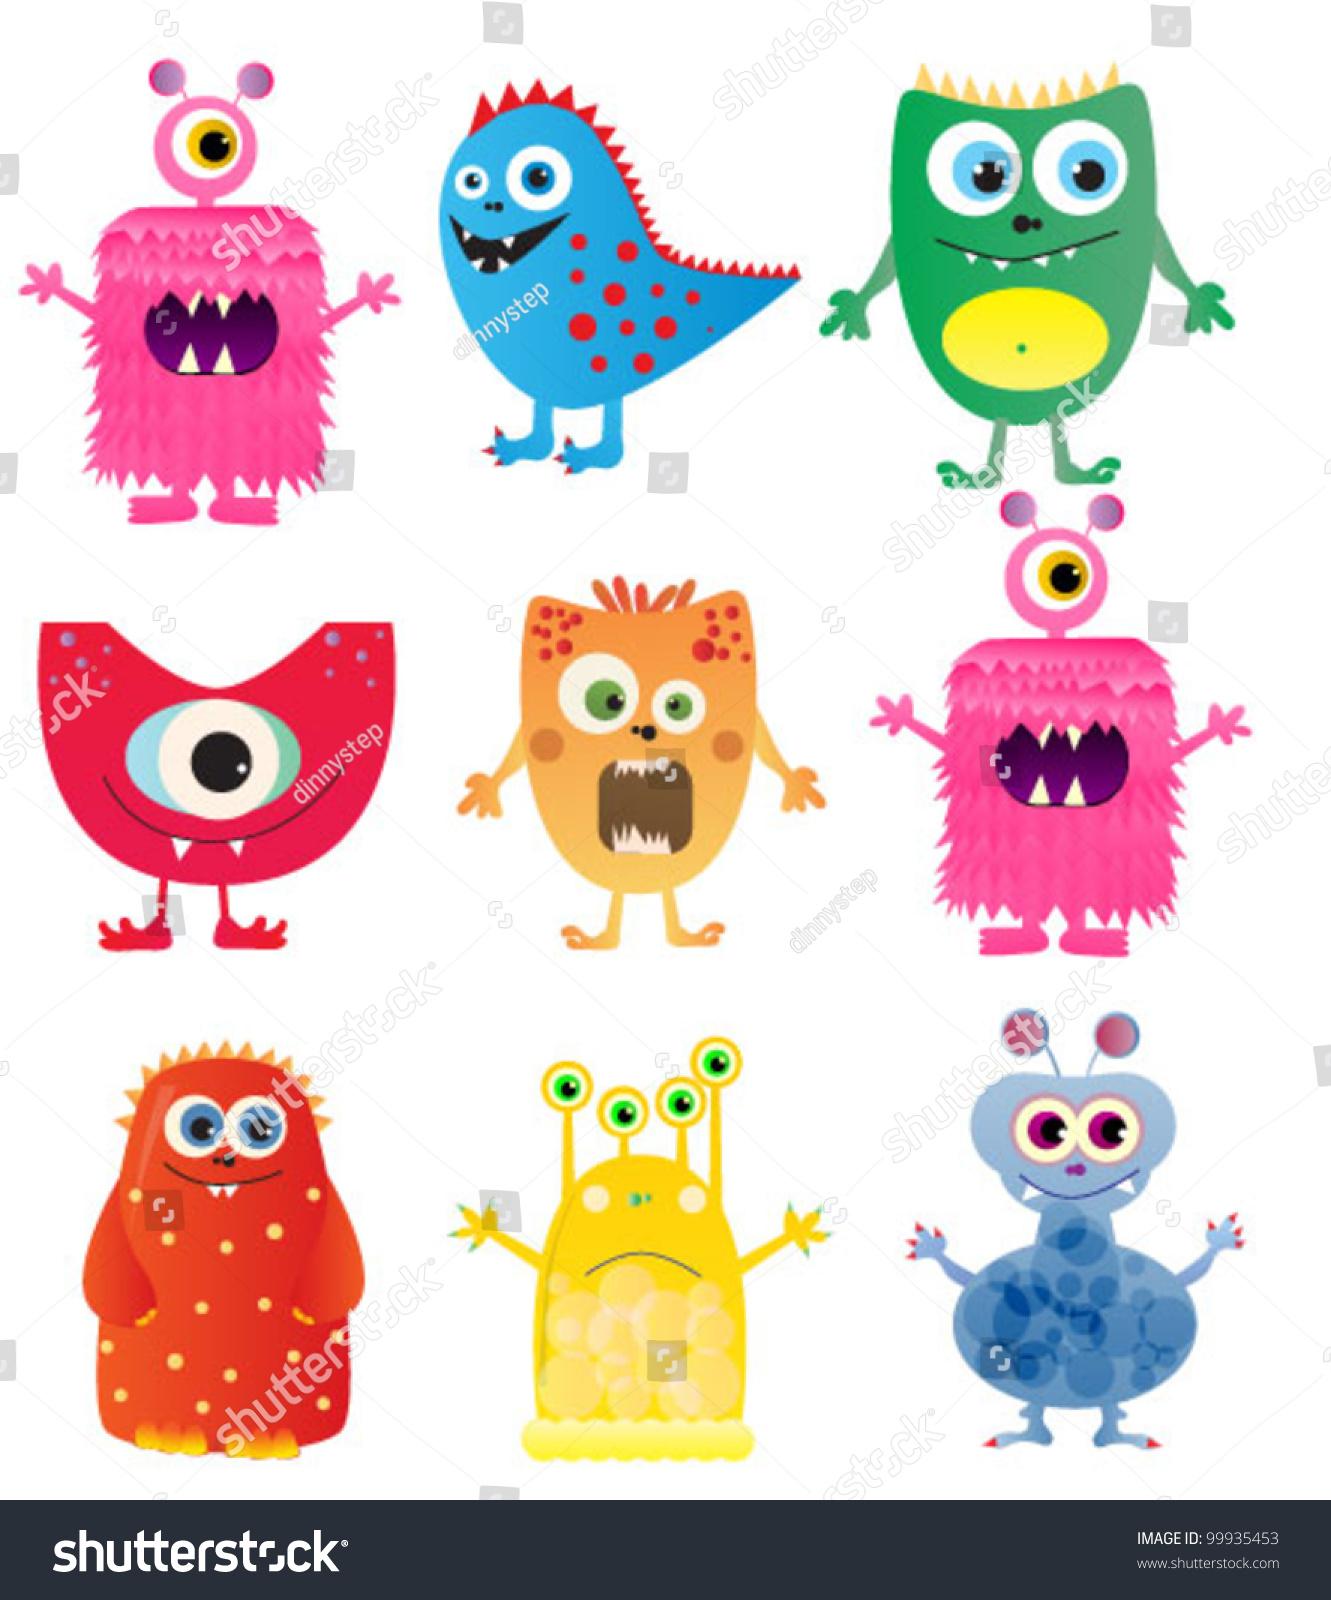 cute-cartoon-menx-drilled-be-monster-video